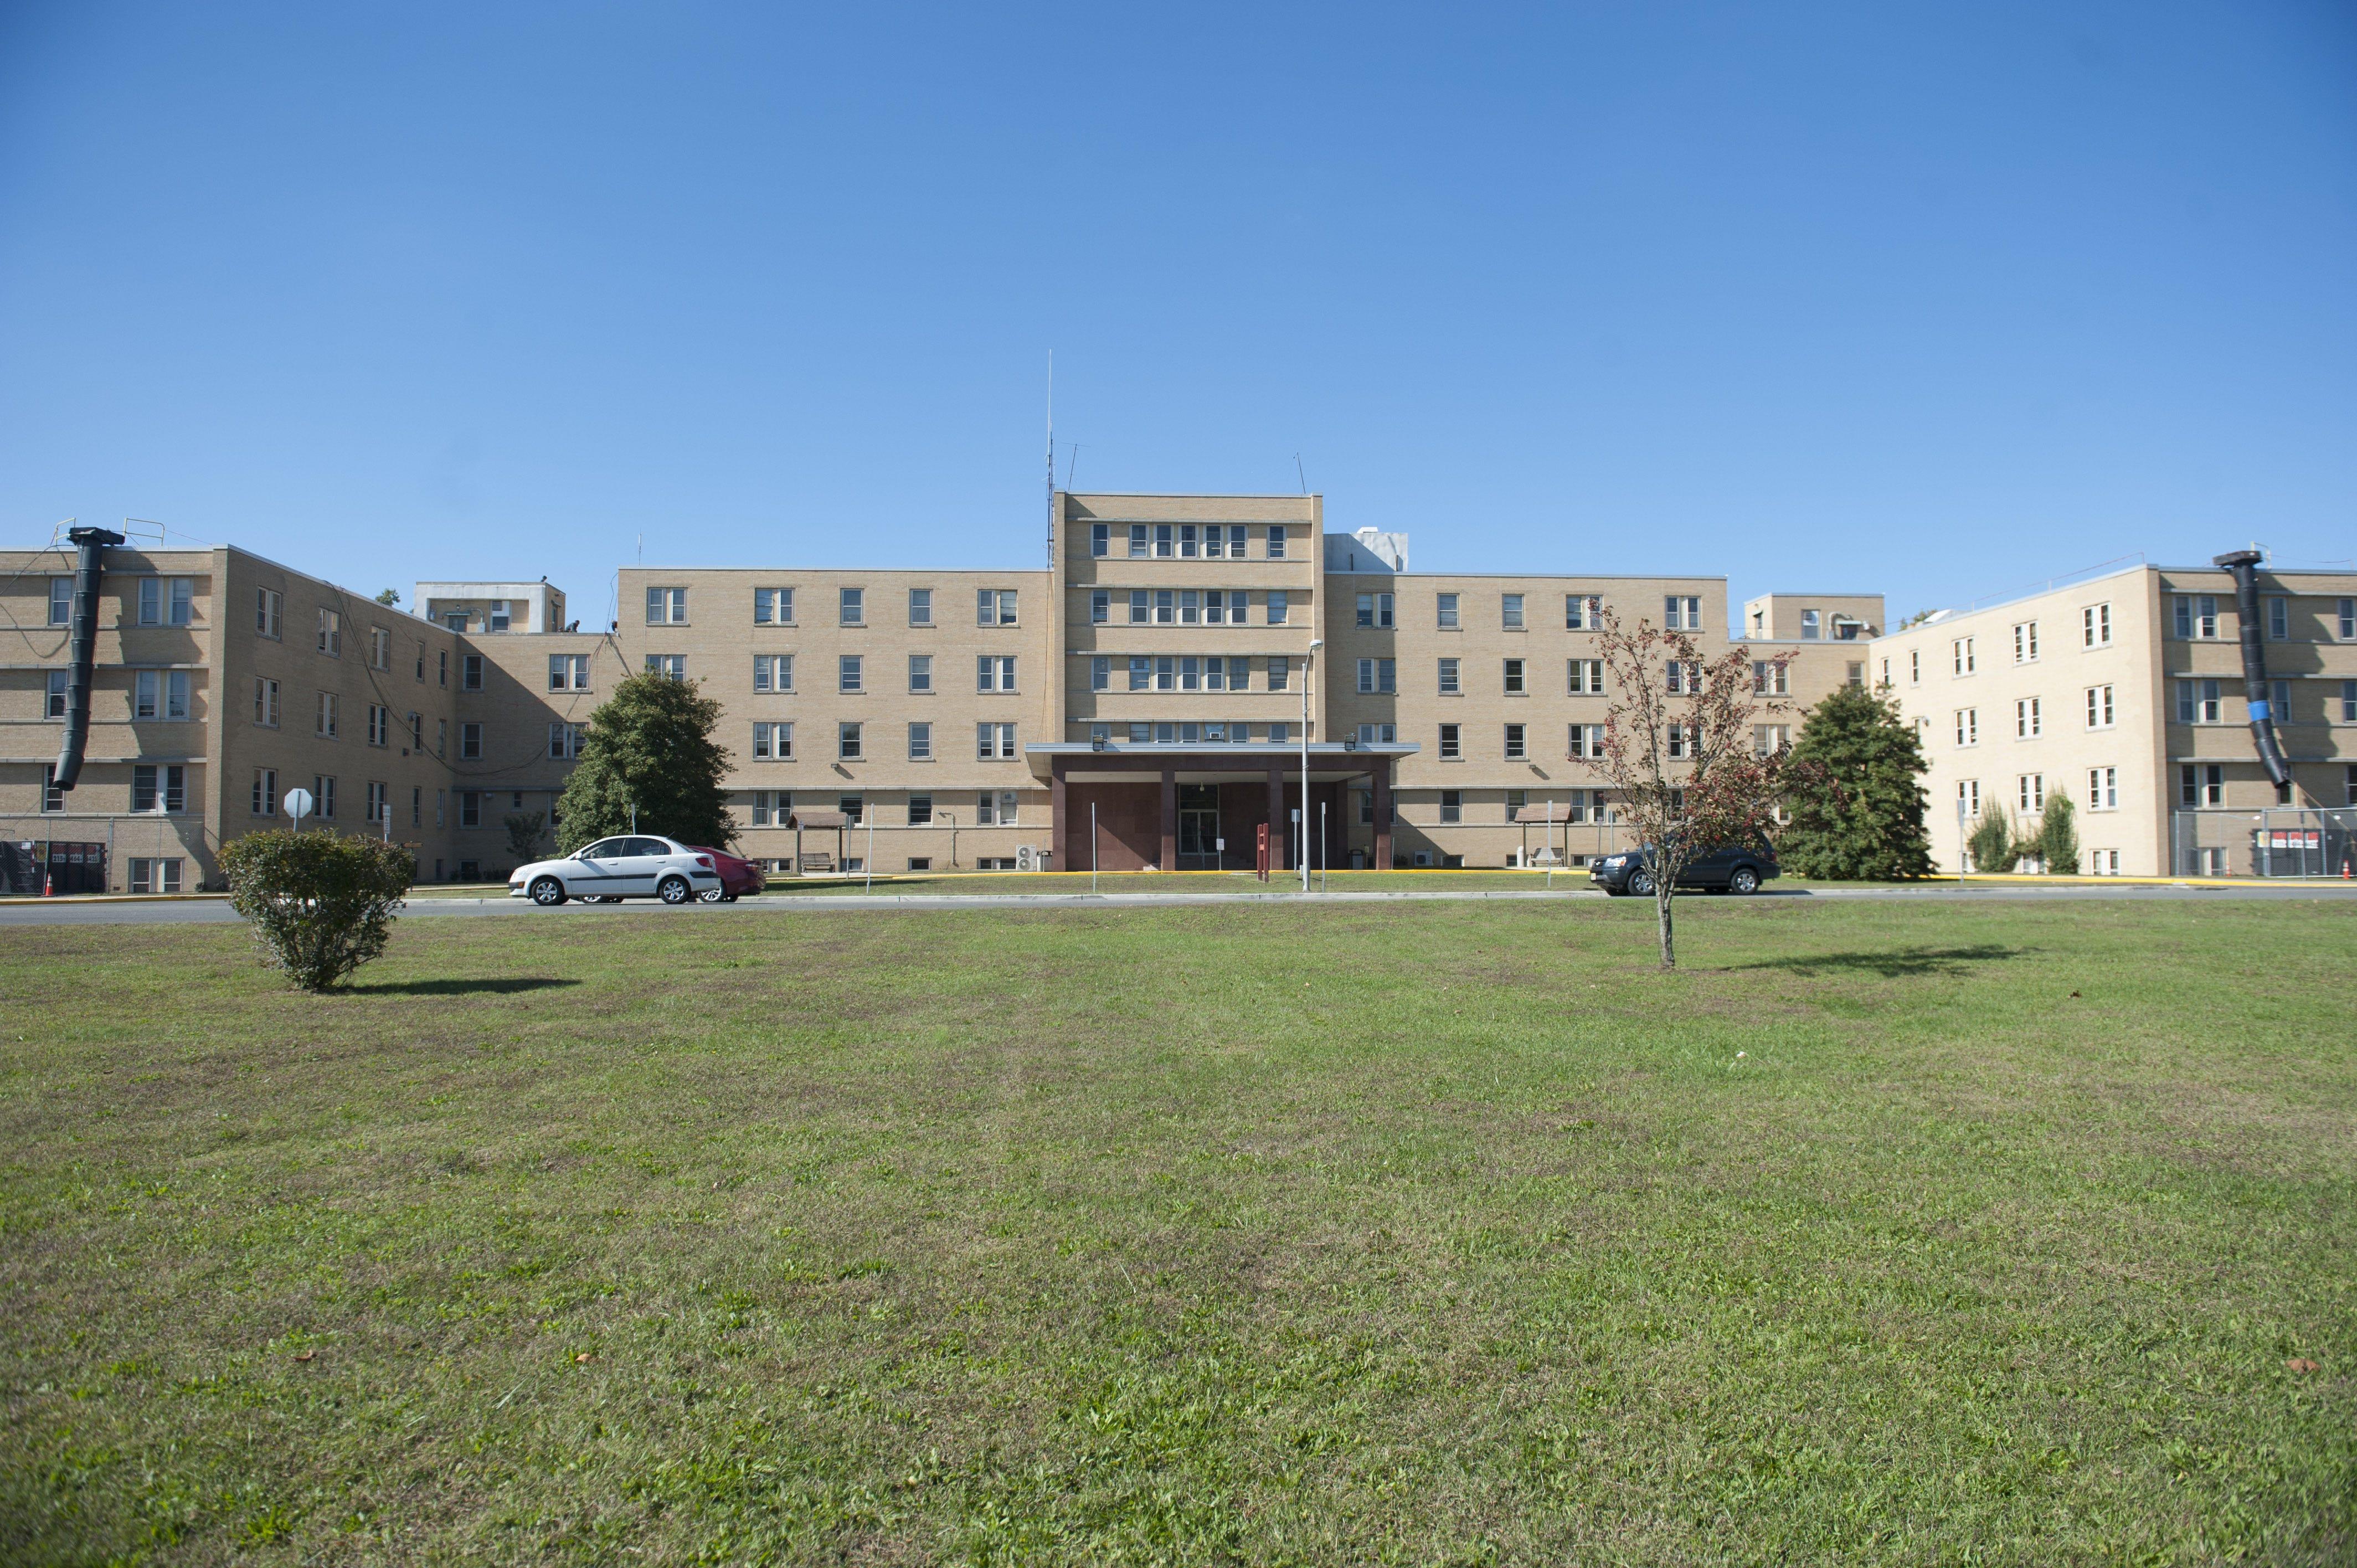 Ancora Psychiatric Hospital, Winslow Twp., Camden County